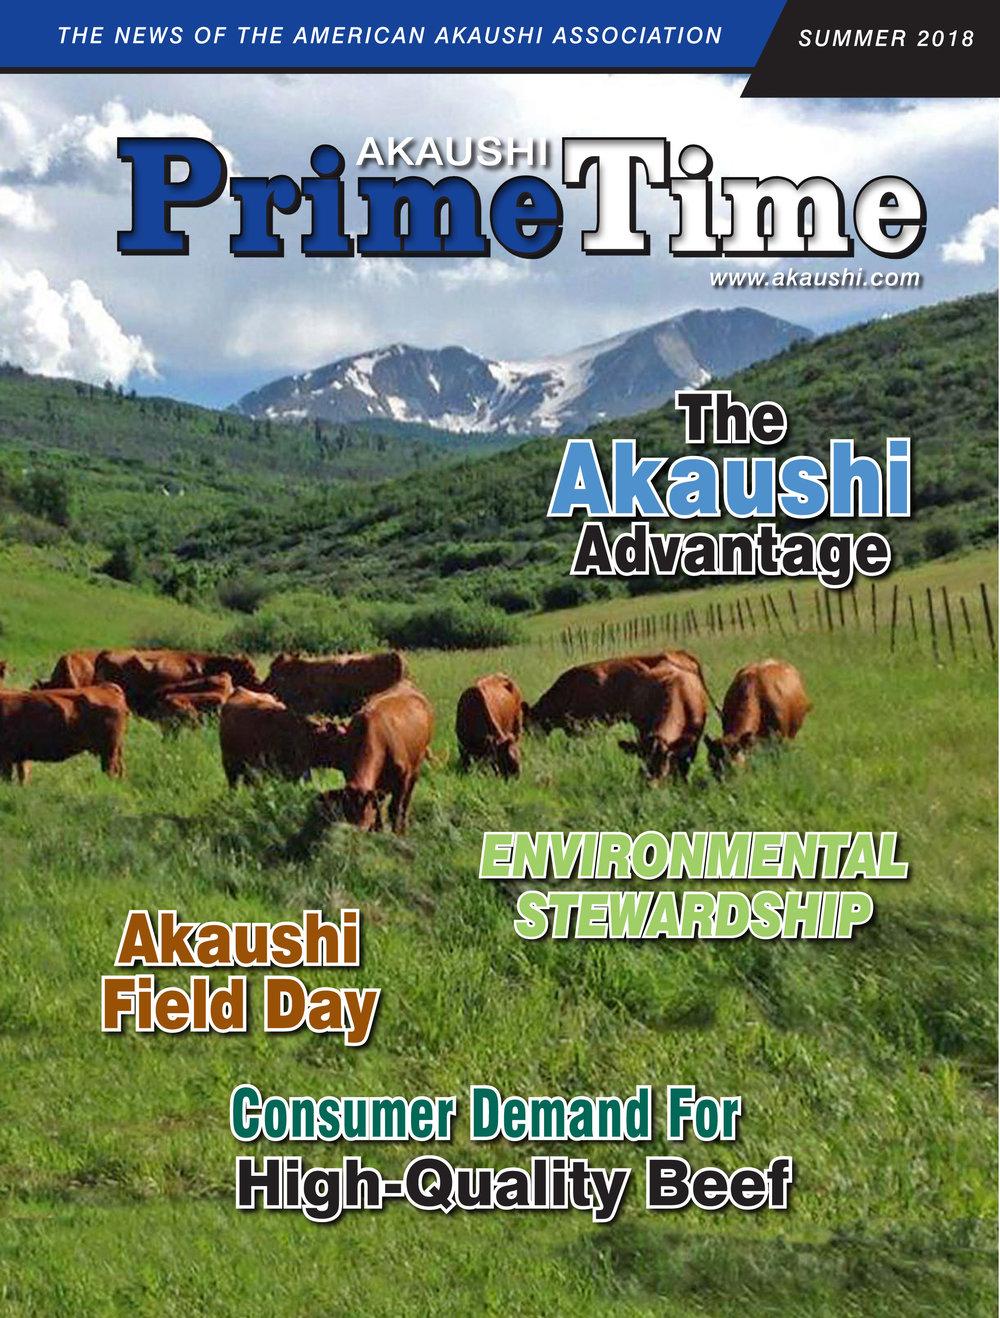 PTSU18_cover_hires.jpg